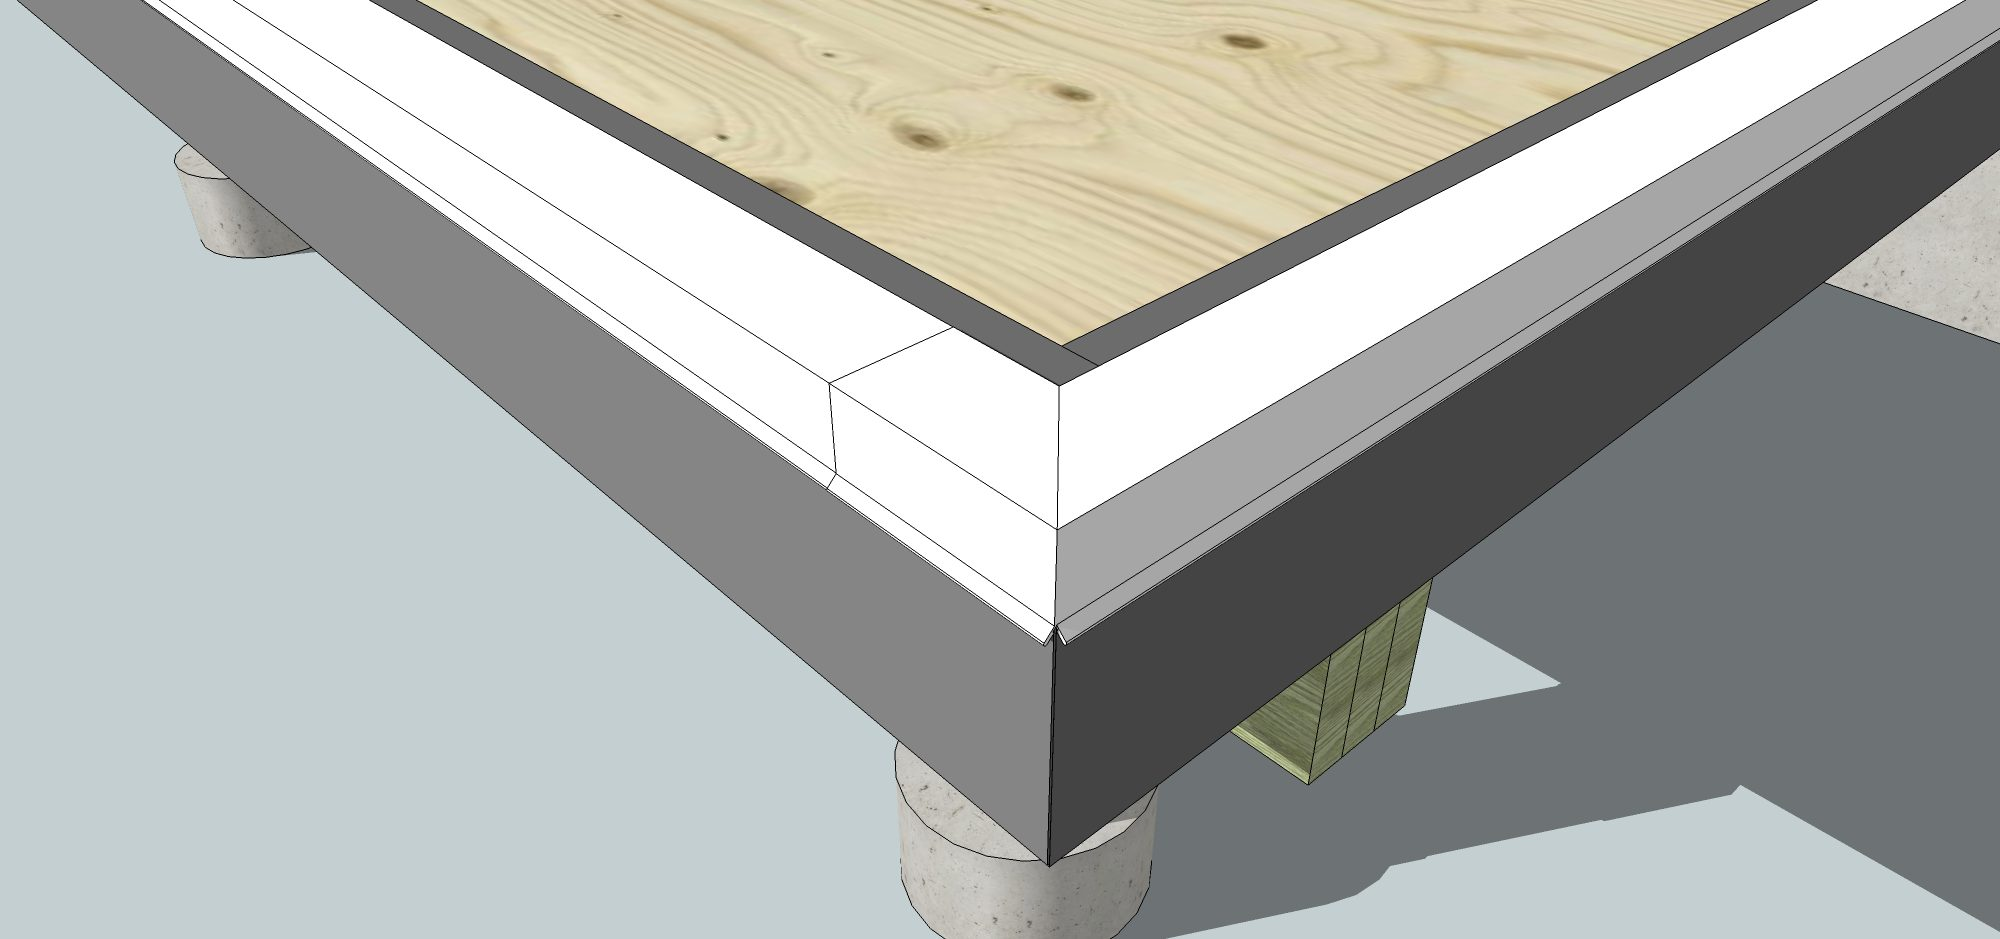 Sunroom Deck Flashing-3